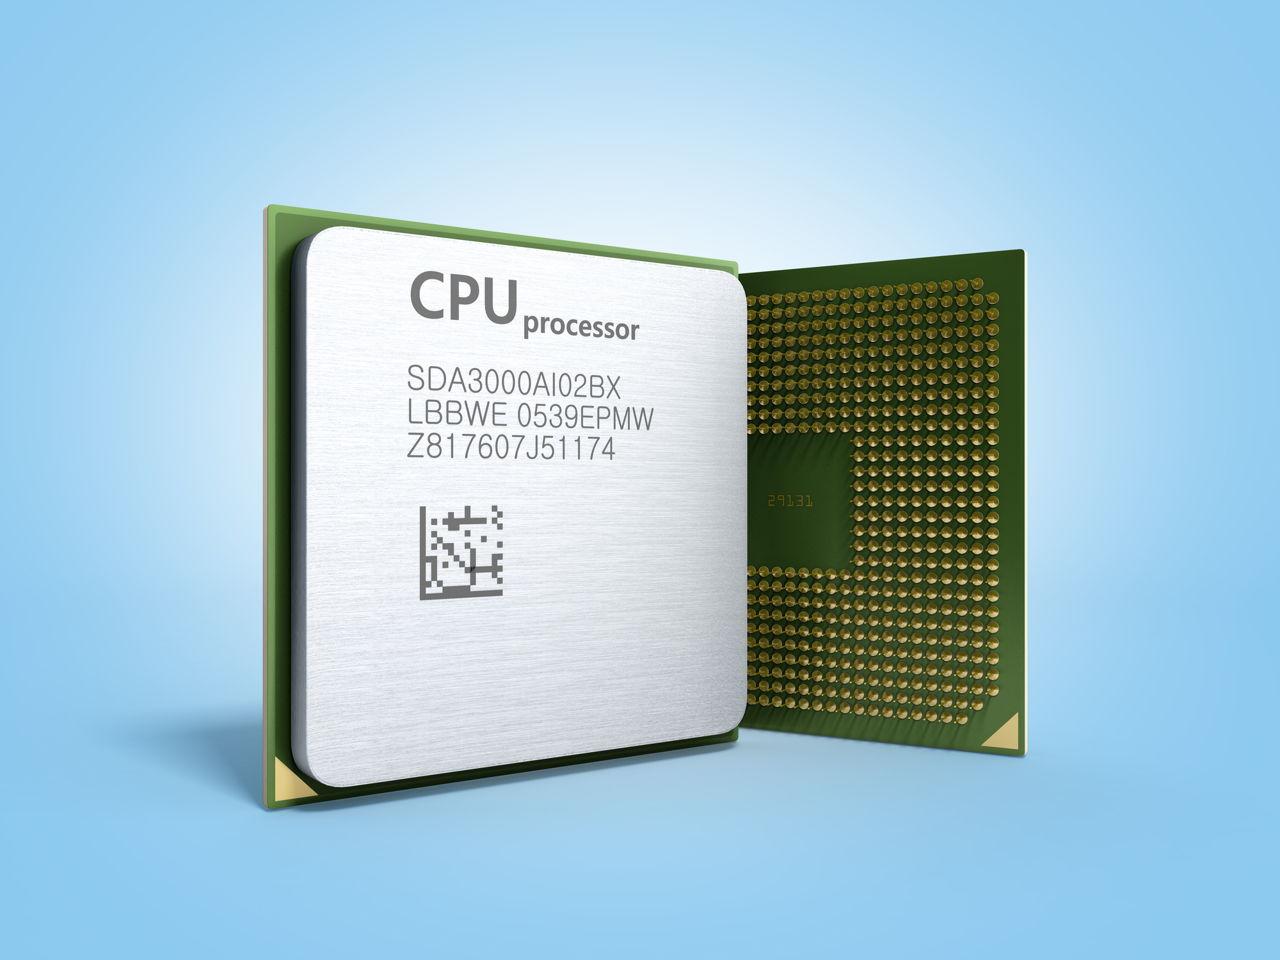 Intel Core i7 Vs. AMD Phenom II X6